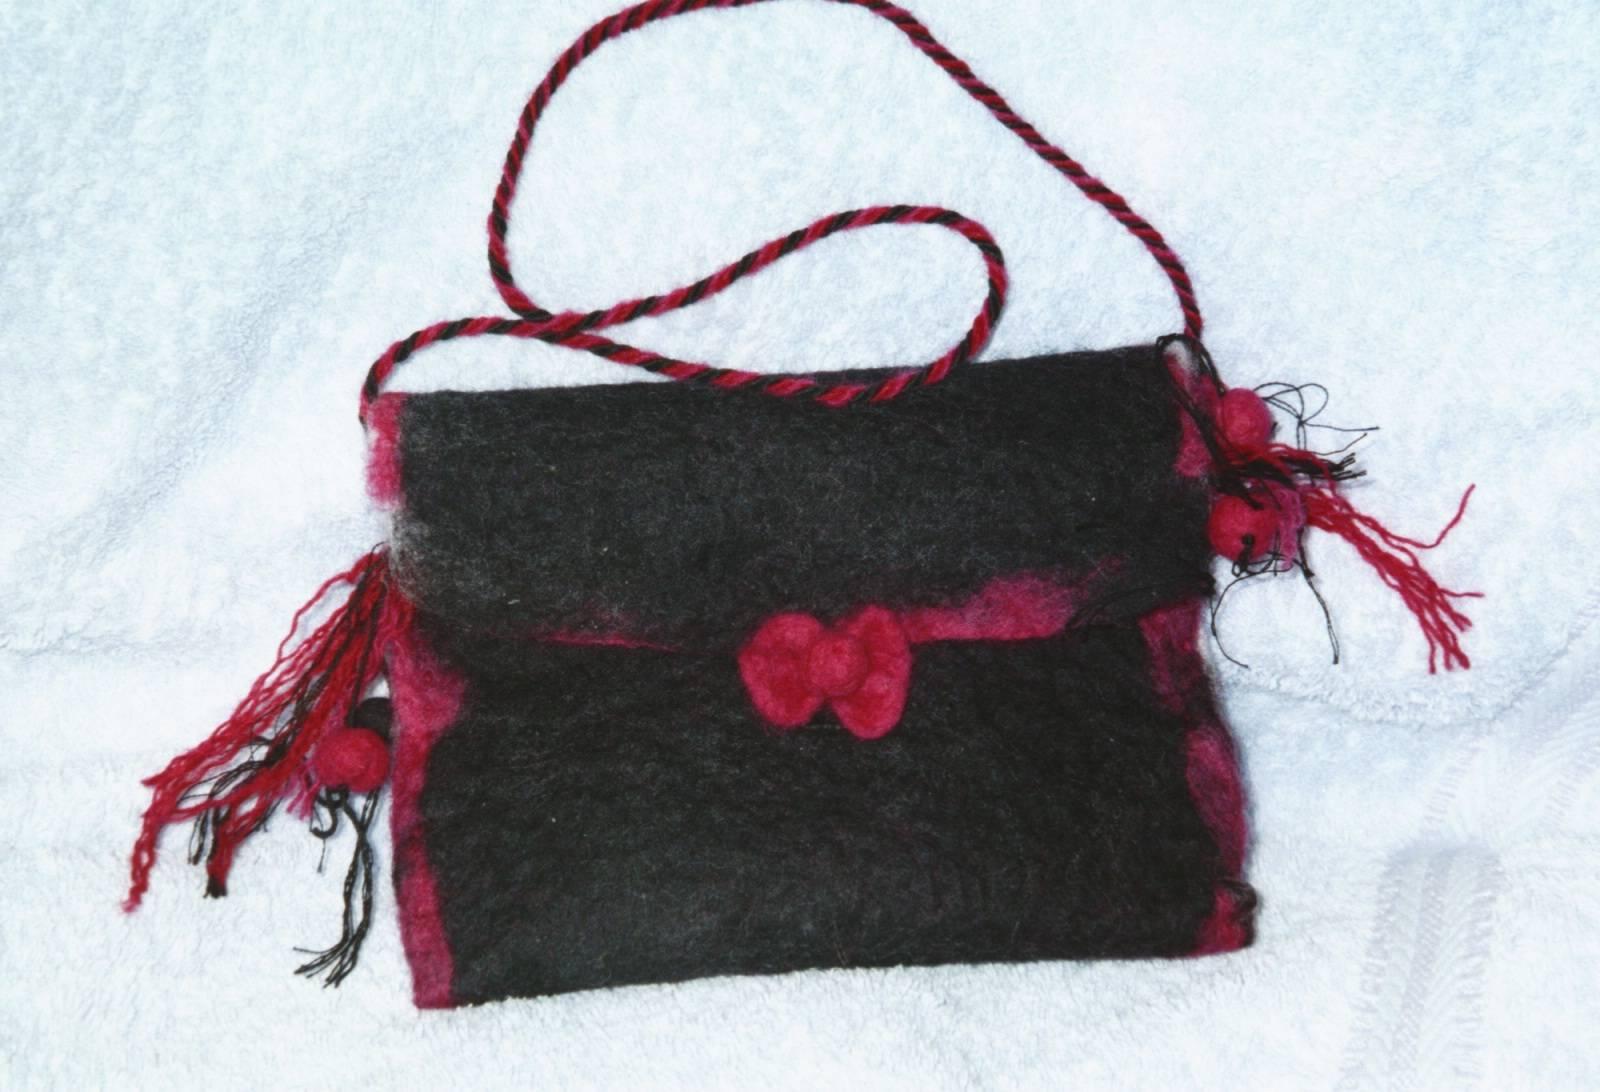 Black bag - handmade felt